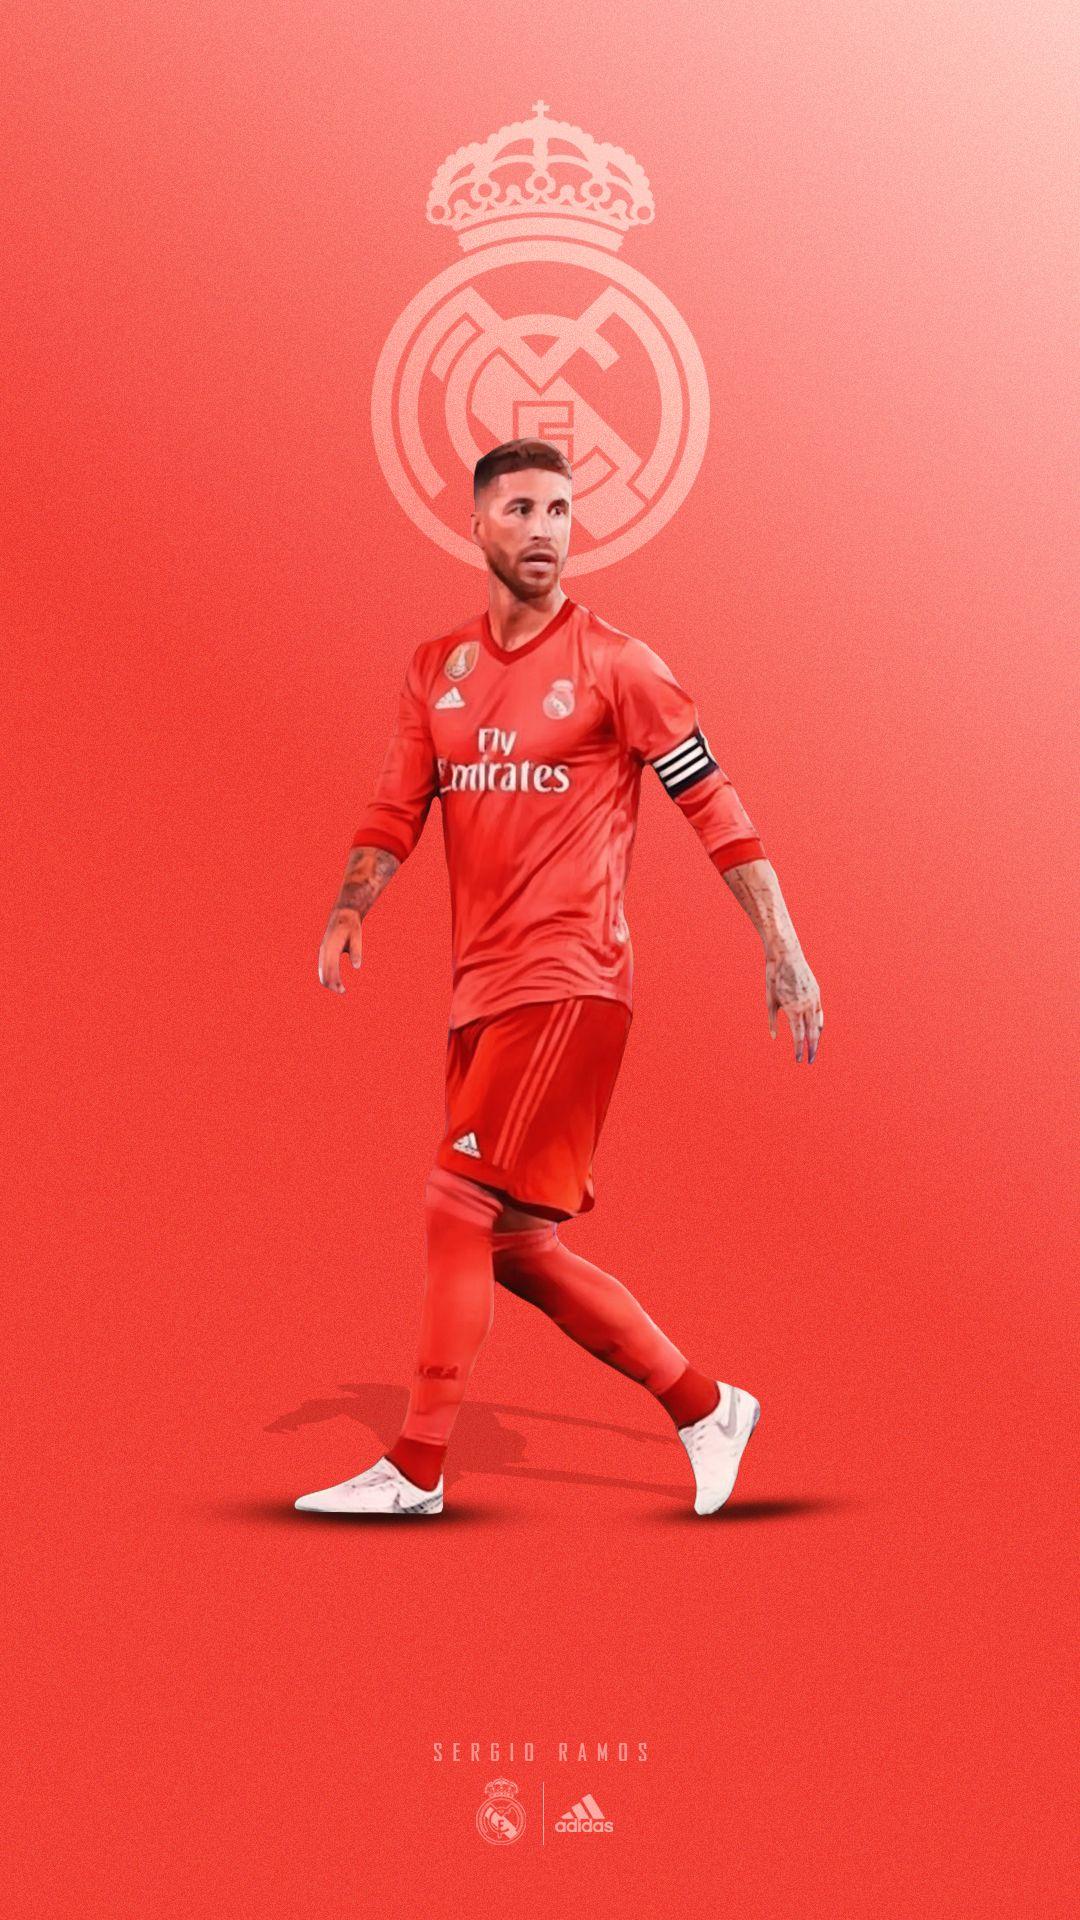 Sergio Ramos Real Madrid sergioramos x realmadrid (con